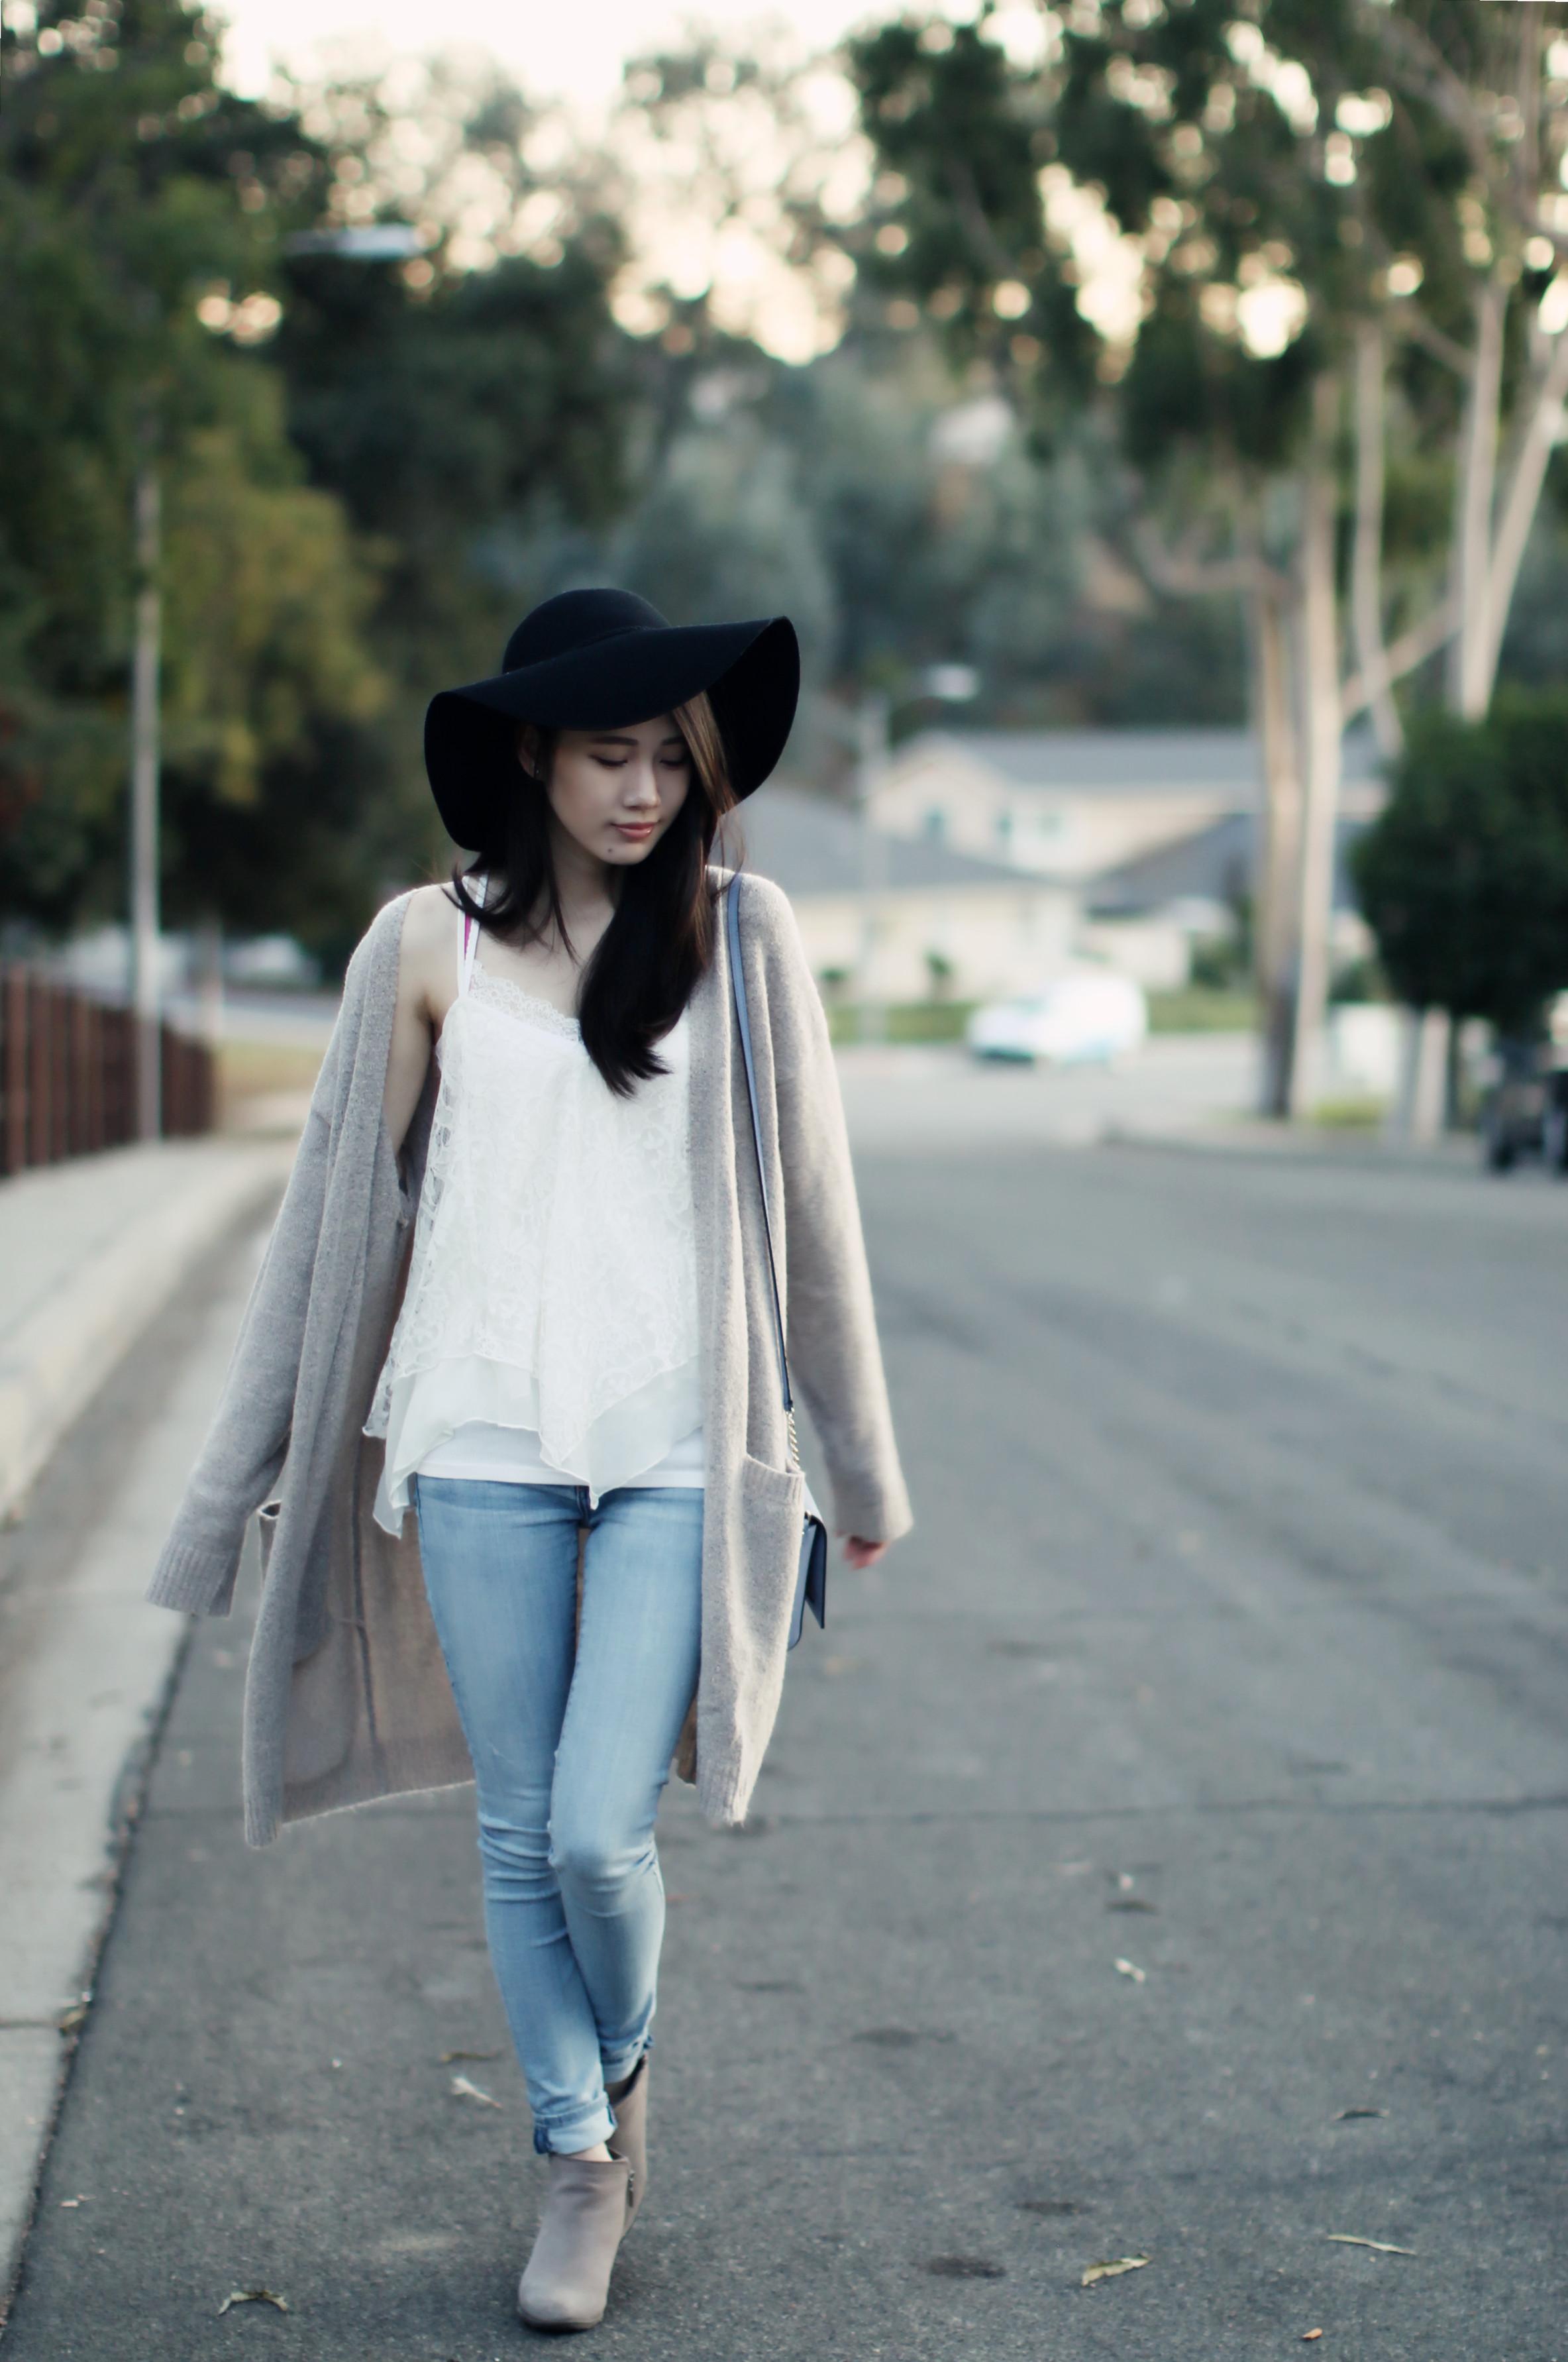 3847-ootd-fashion-style-outfitoftheday-wiwt-nordstrom-abercrombie-bohemian-fallfashion-forever21-f21-f21xme-koreanfashion-elizabeeetht-clothestoyouuu